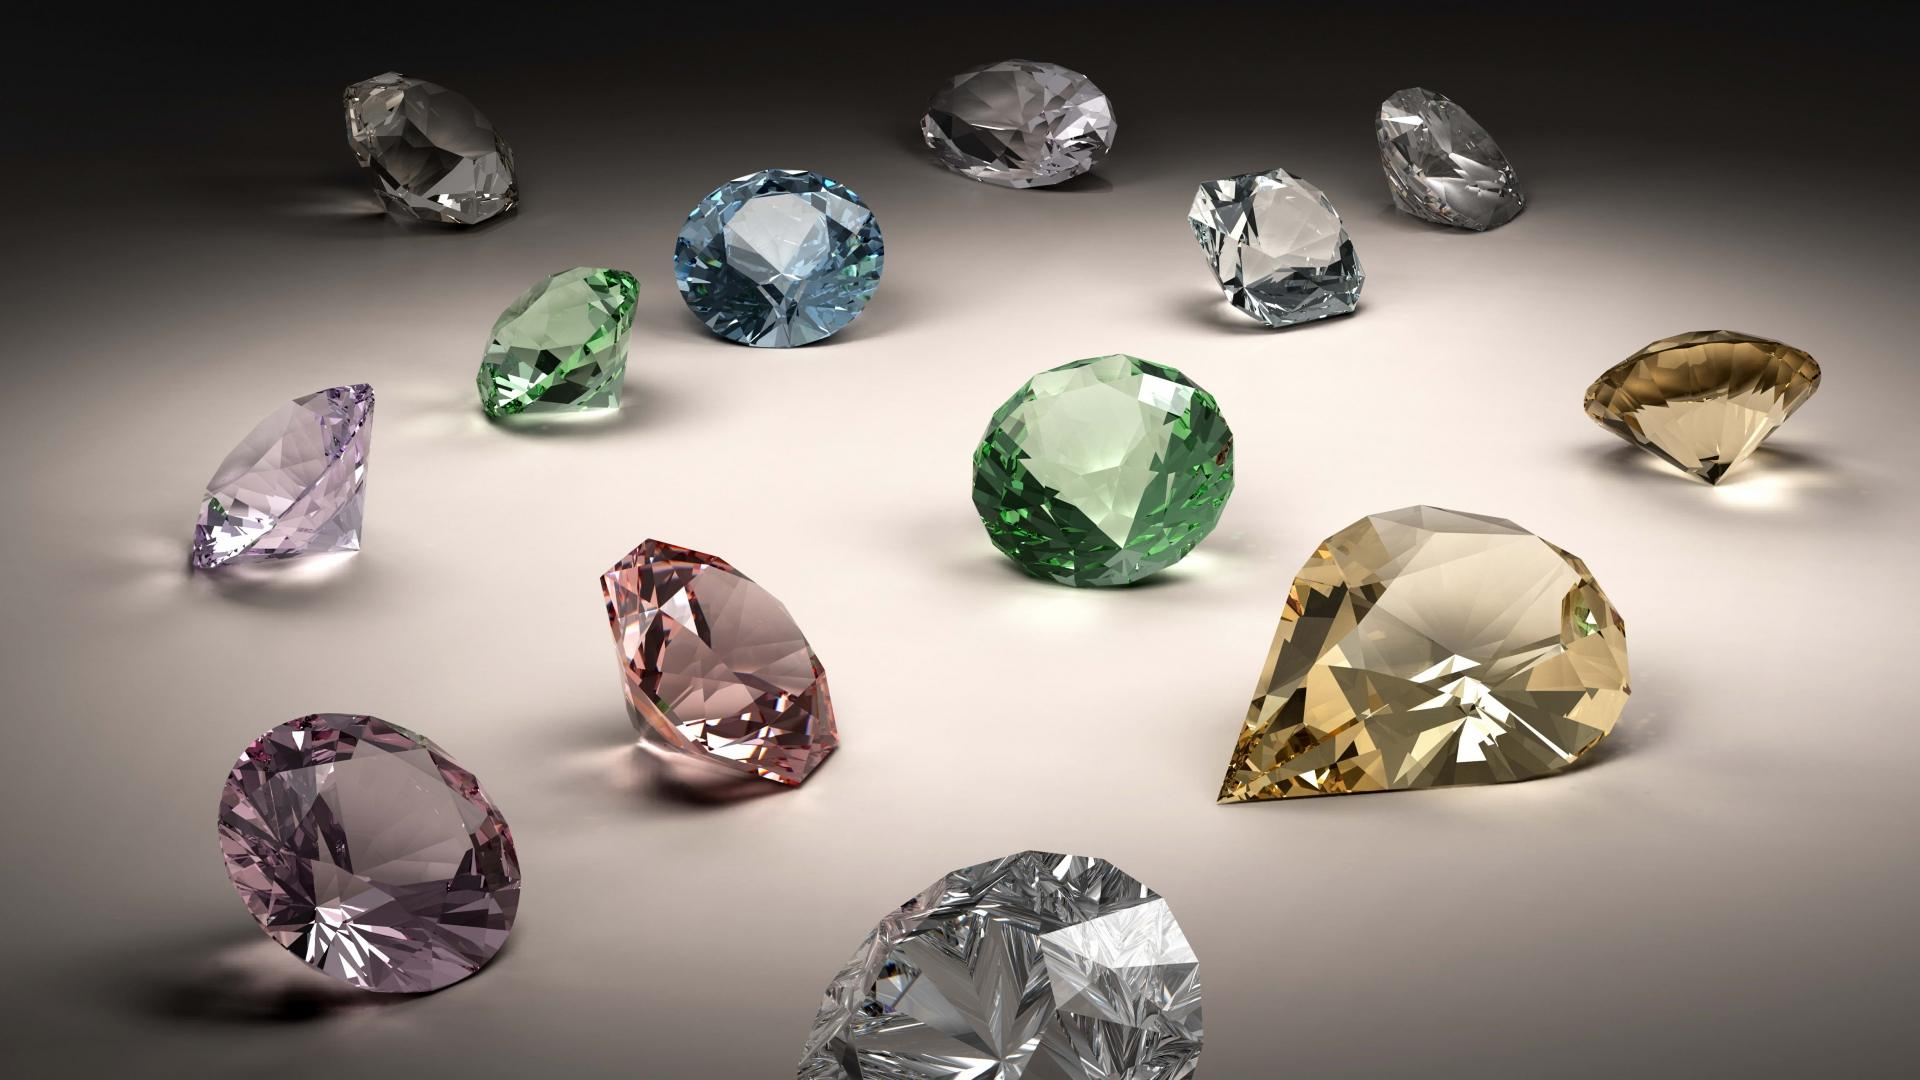 Камент Фианит: свойства, значение, фото, кому подходит по знаку